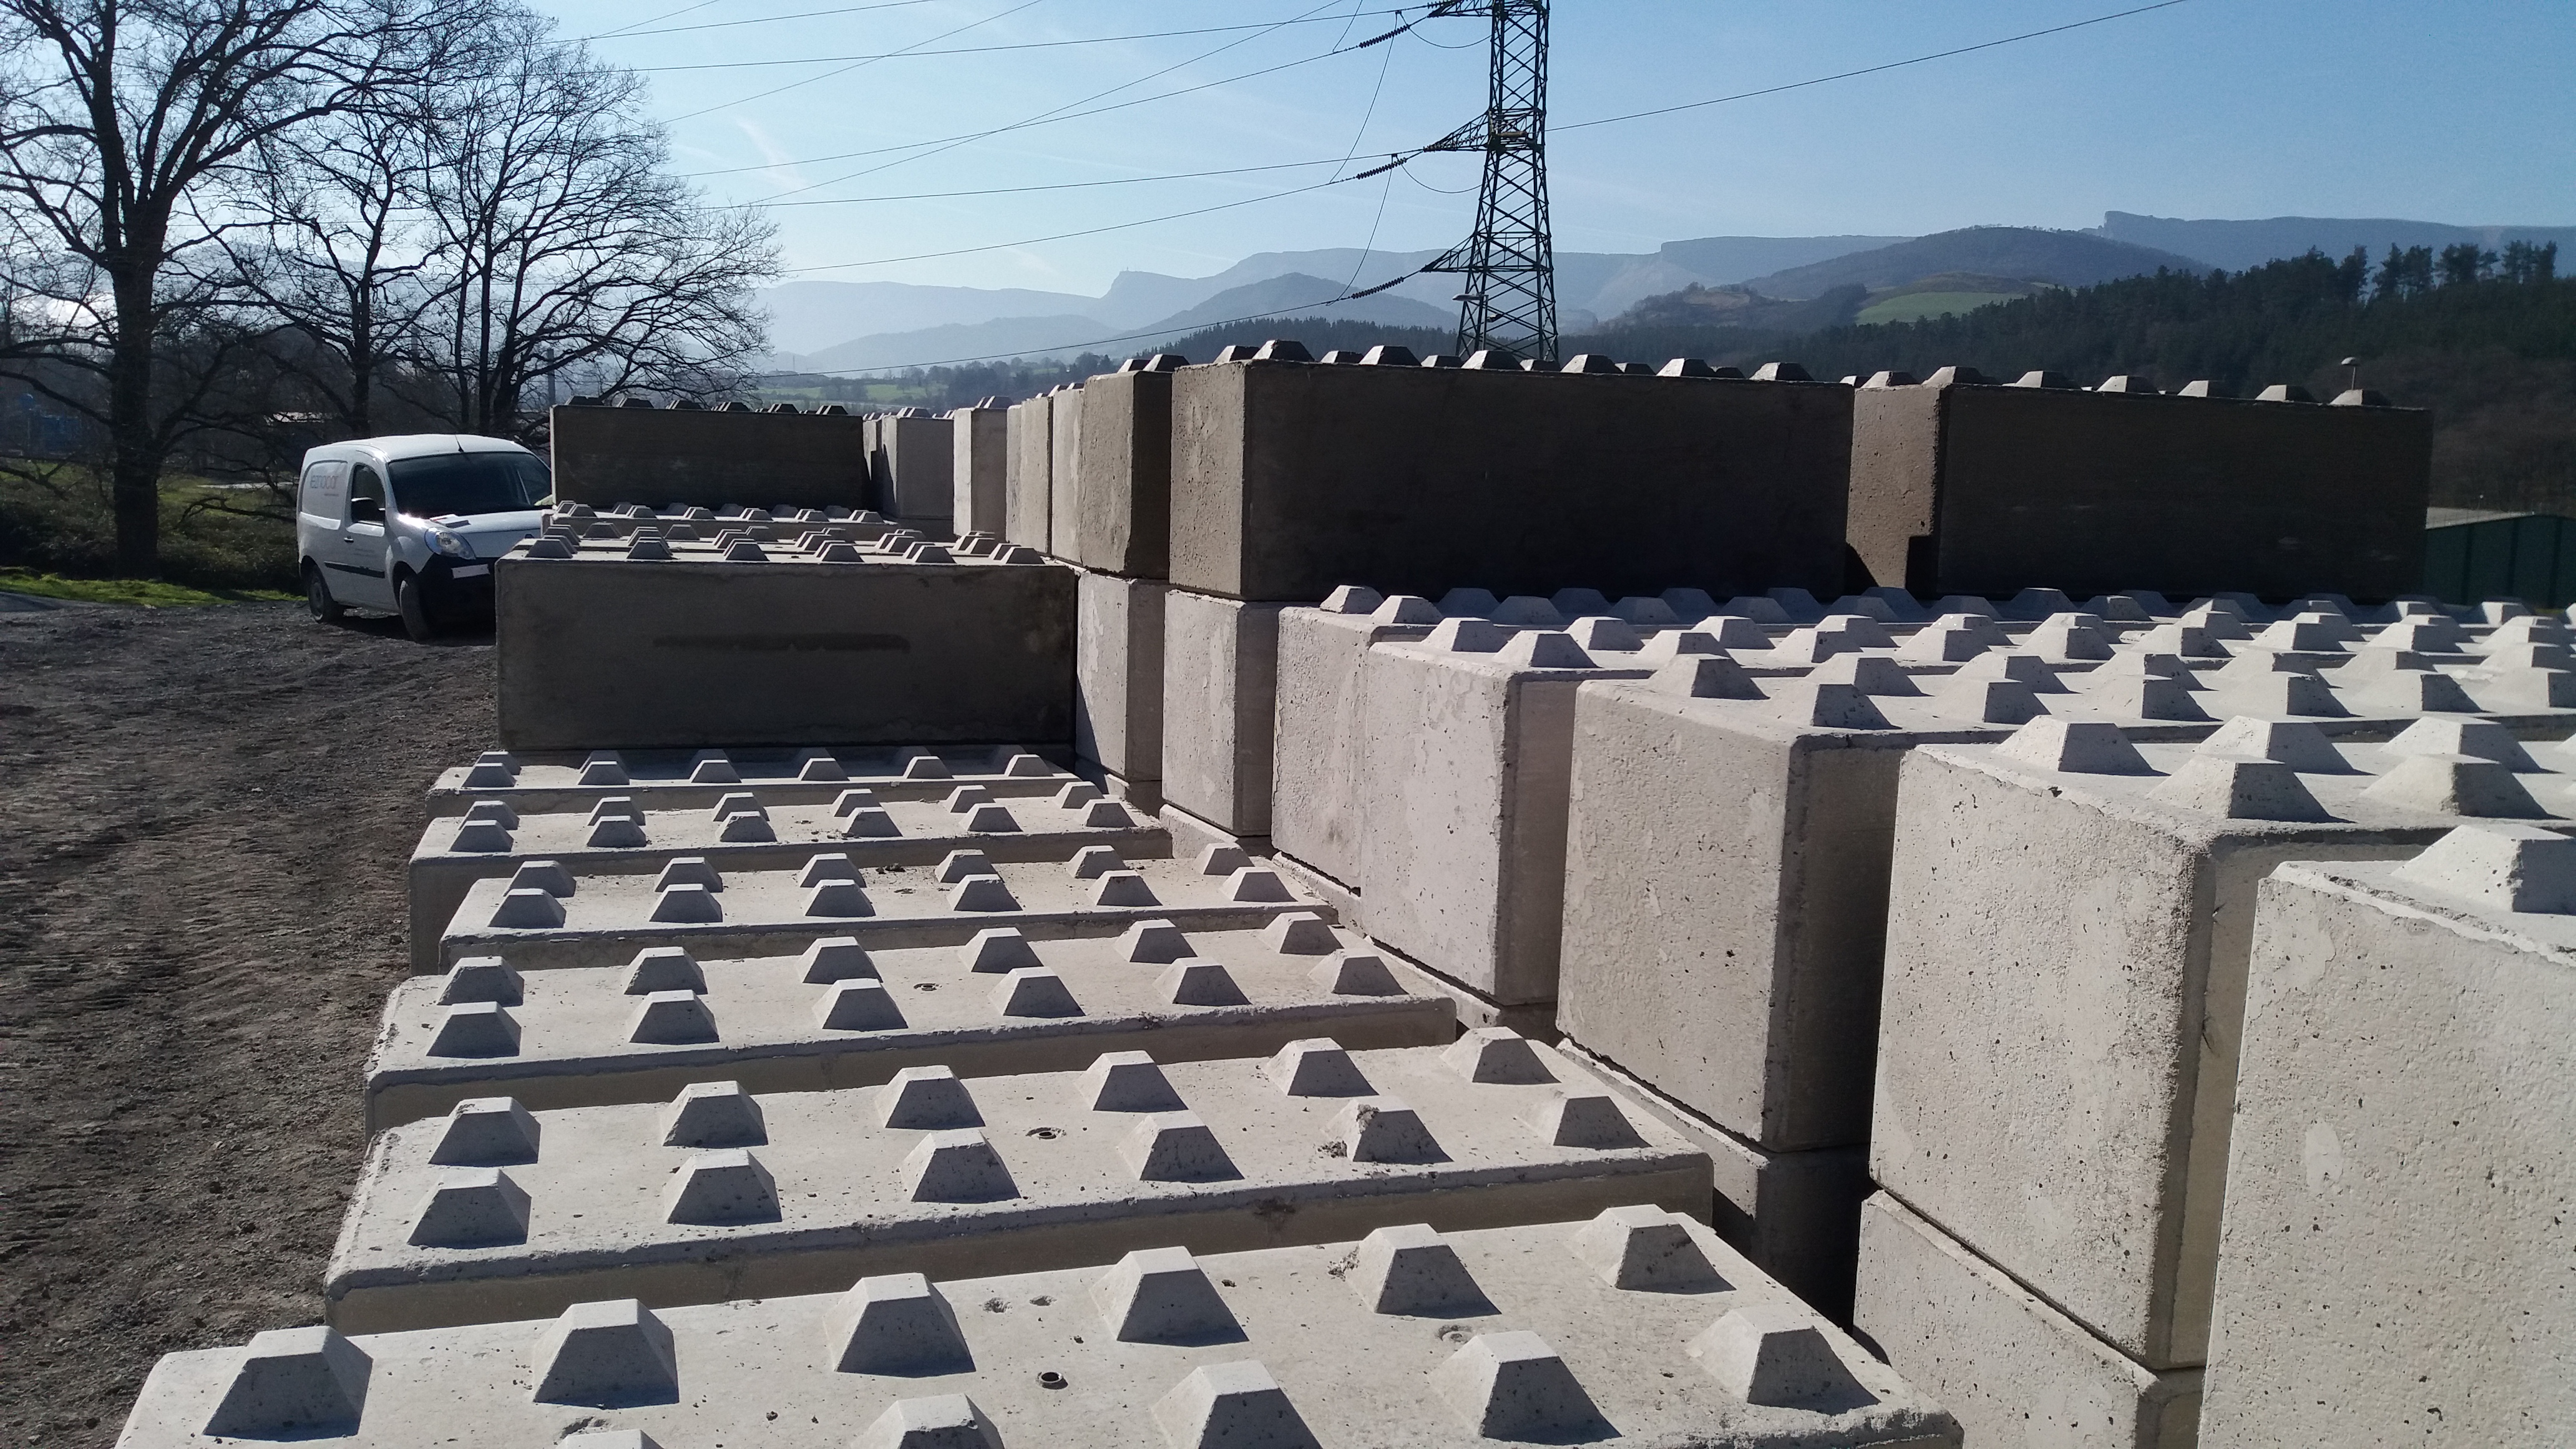 Bloques de hormigon para muros interesting moldes para - Bloques para muros ...